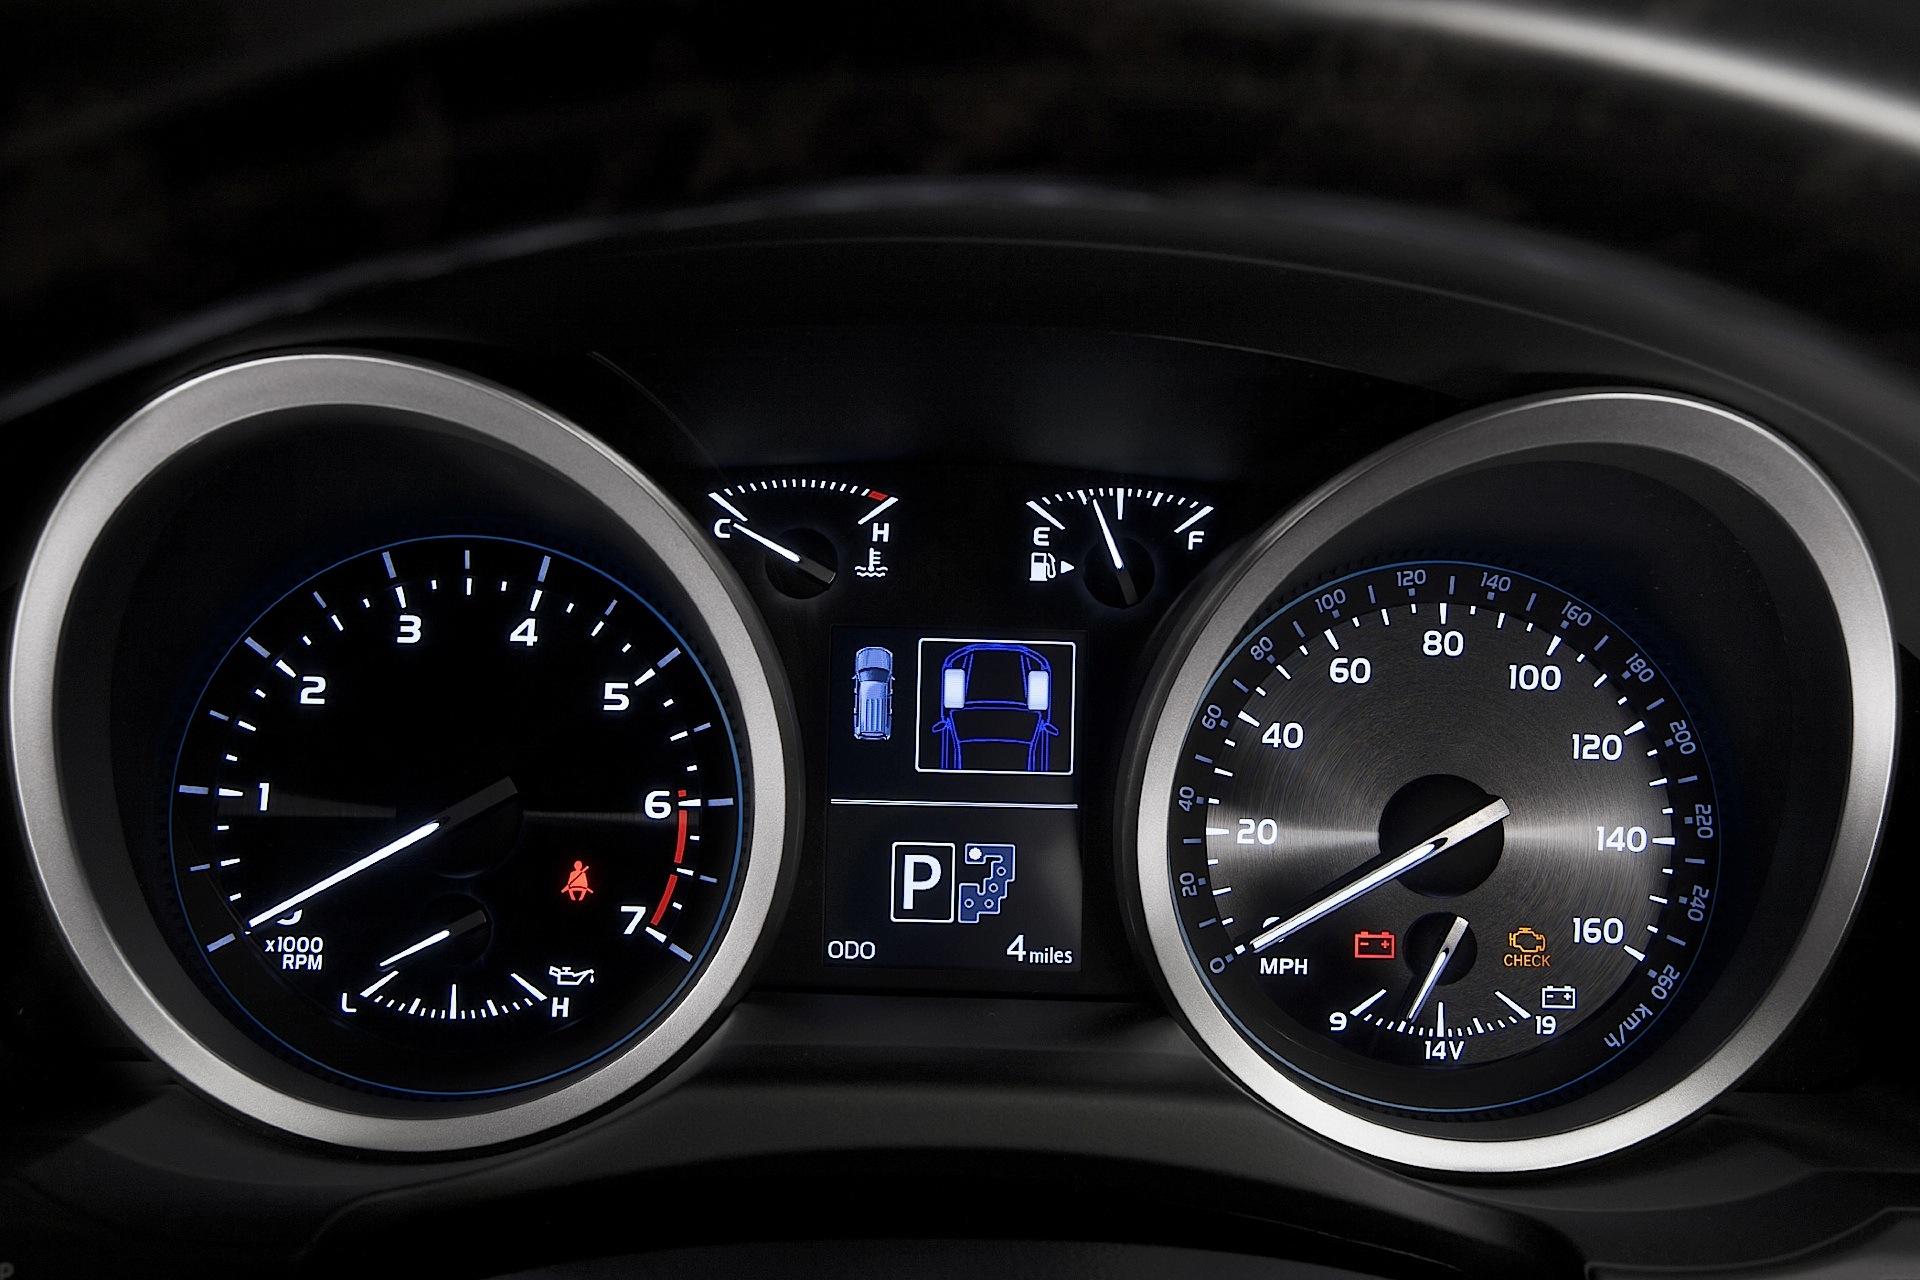 TOYOTA Land Cruiser 200 / V8 - 2007, 2008, 2009, 2010, 2011, 2012 ...